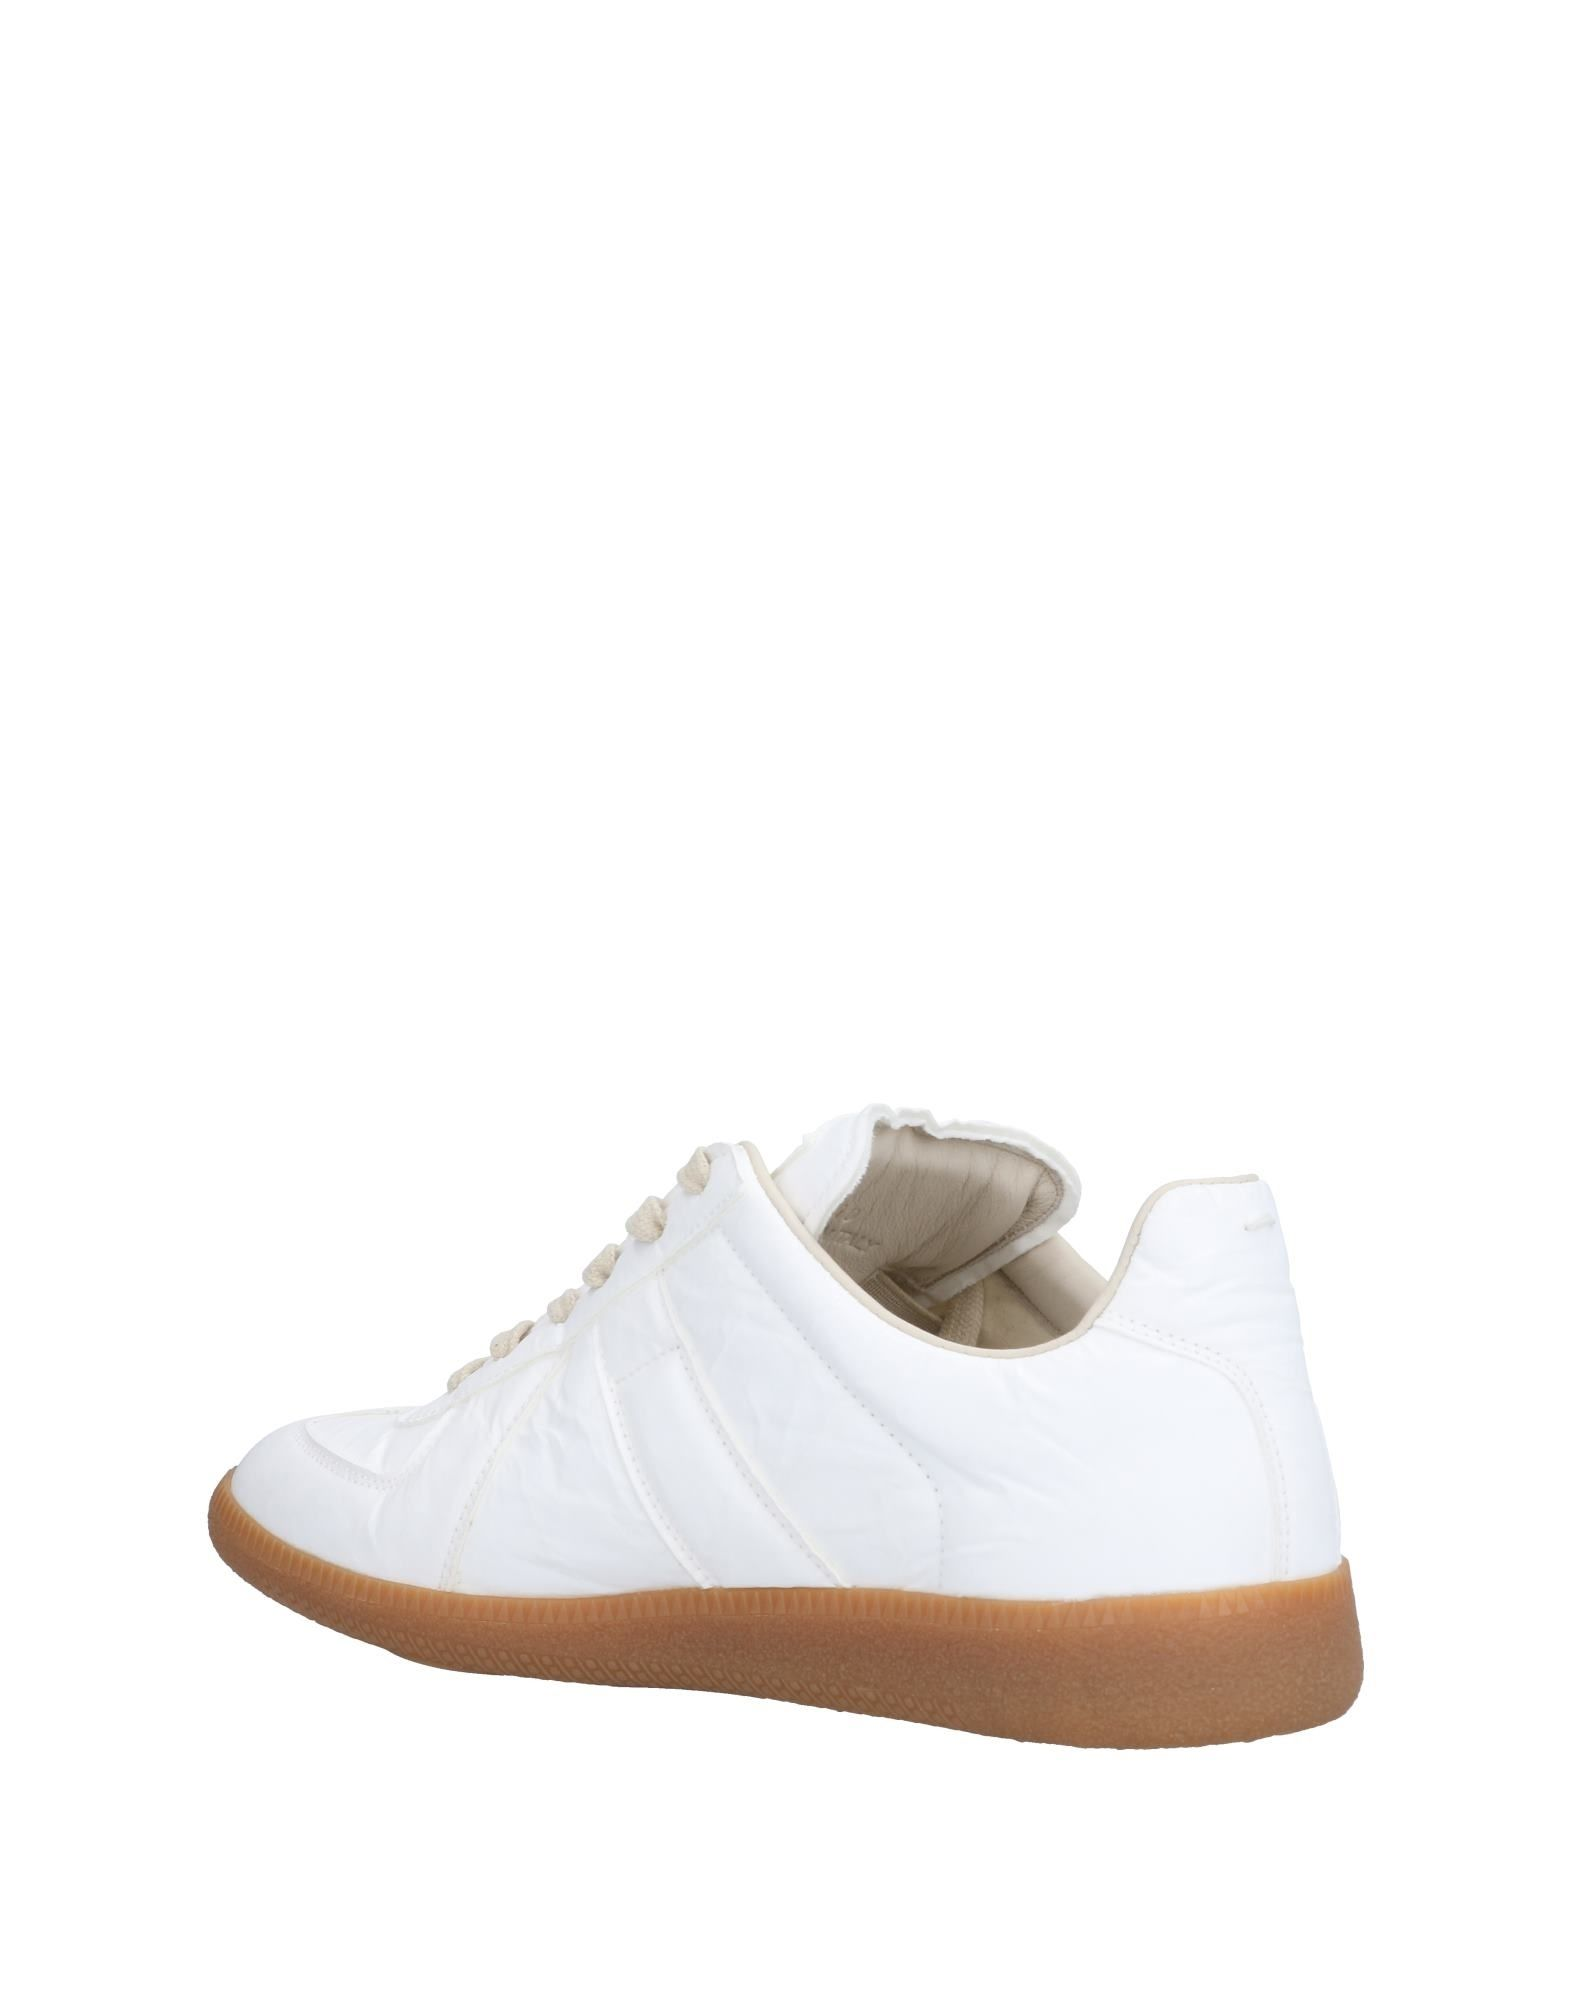 Maison Margiela Sneakers Herren beliebte  11500056QF Gute Qualität beliebte Herren Schuhe 790177